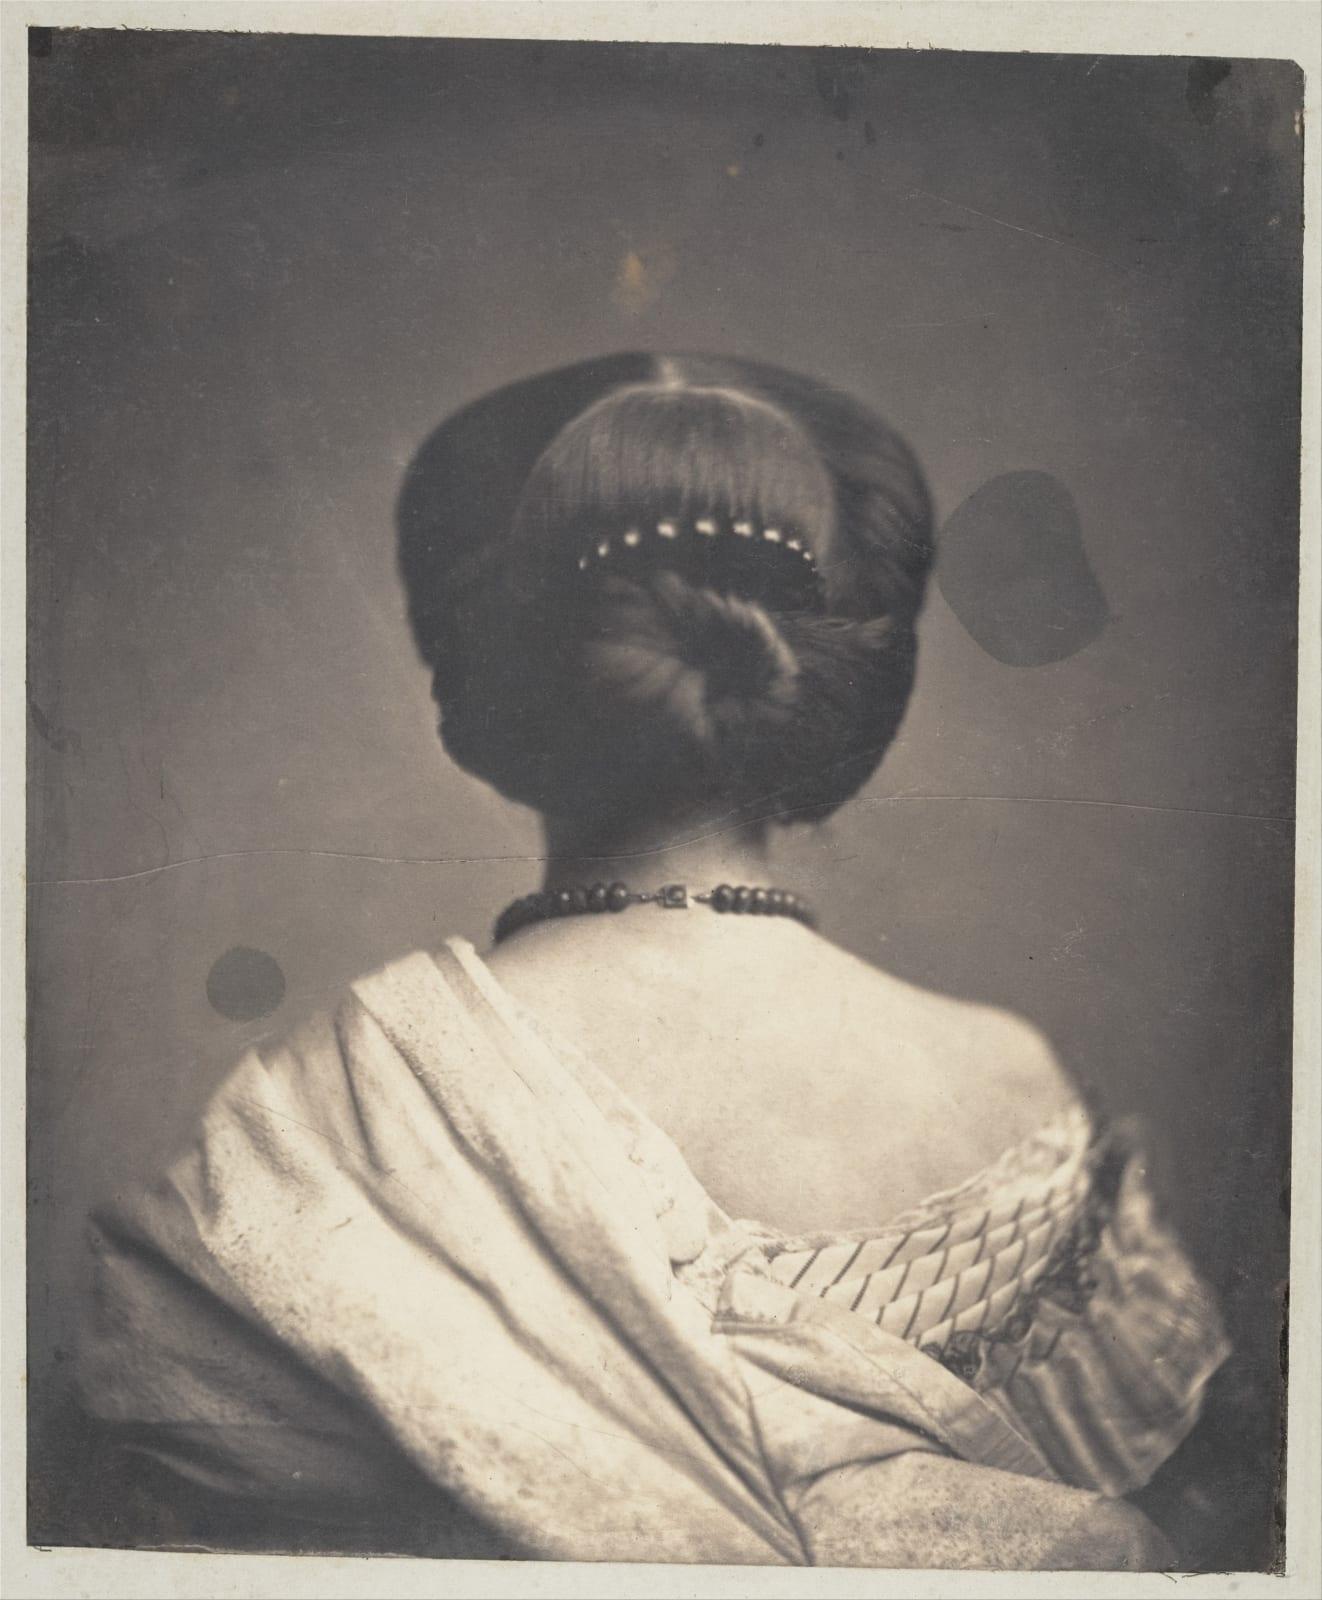 Onésipe Aguado de las Marismas Woman Seen from the Back, ca. 1862 Courtesy of The Metropolitan Museum of Art, New York.